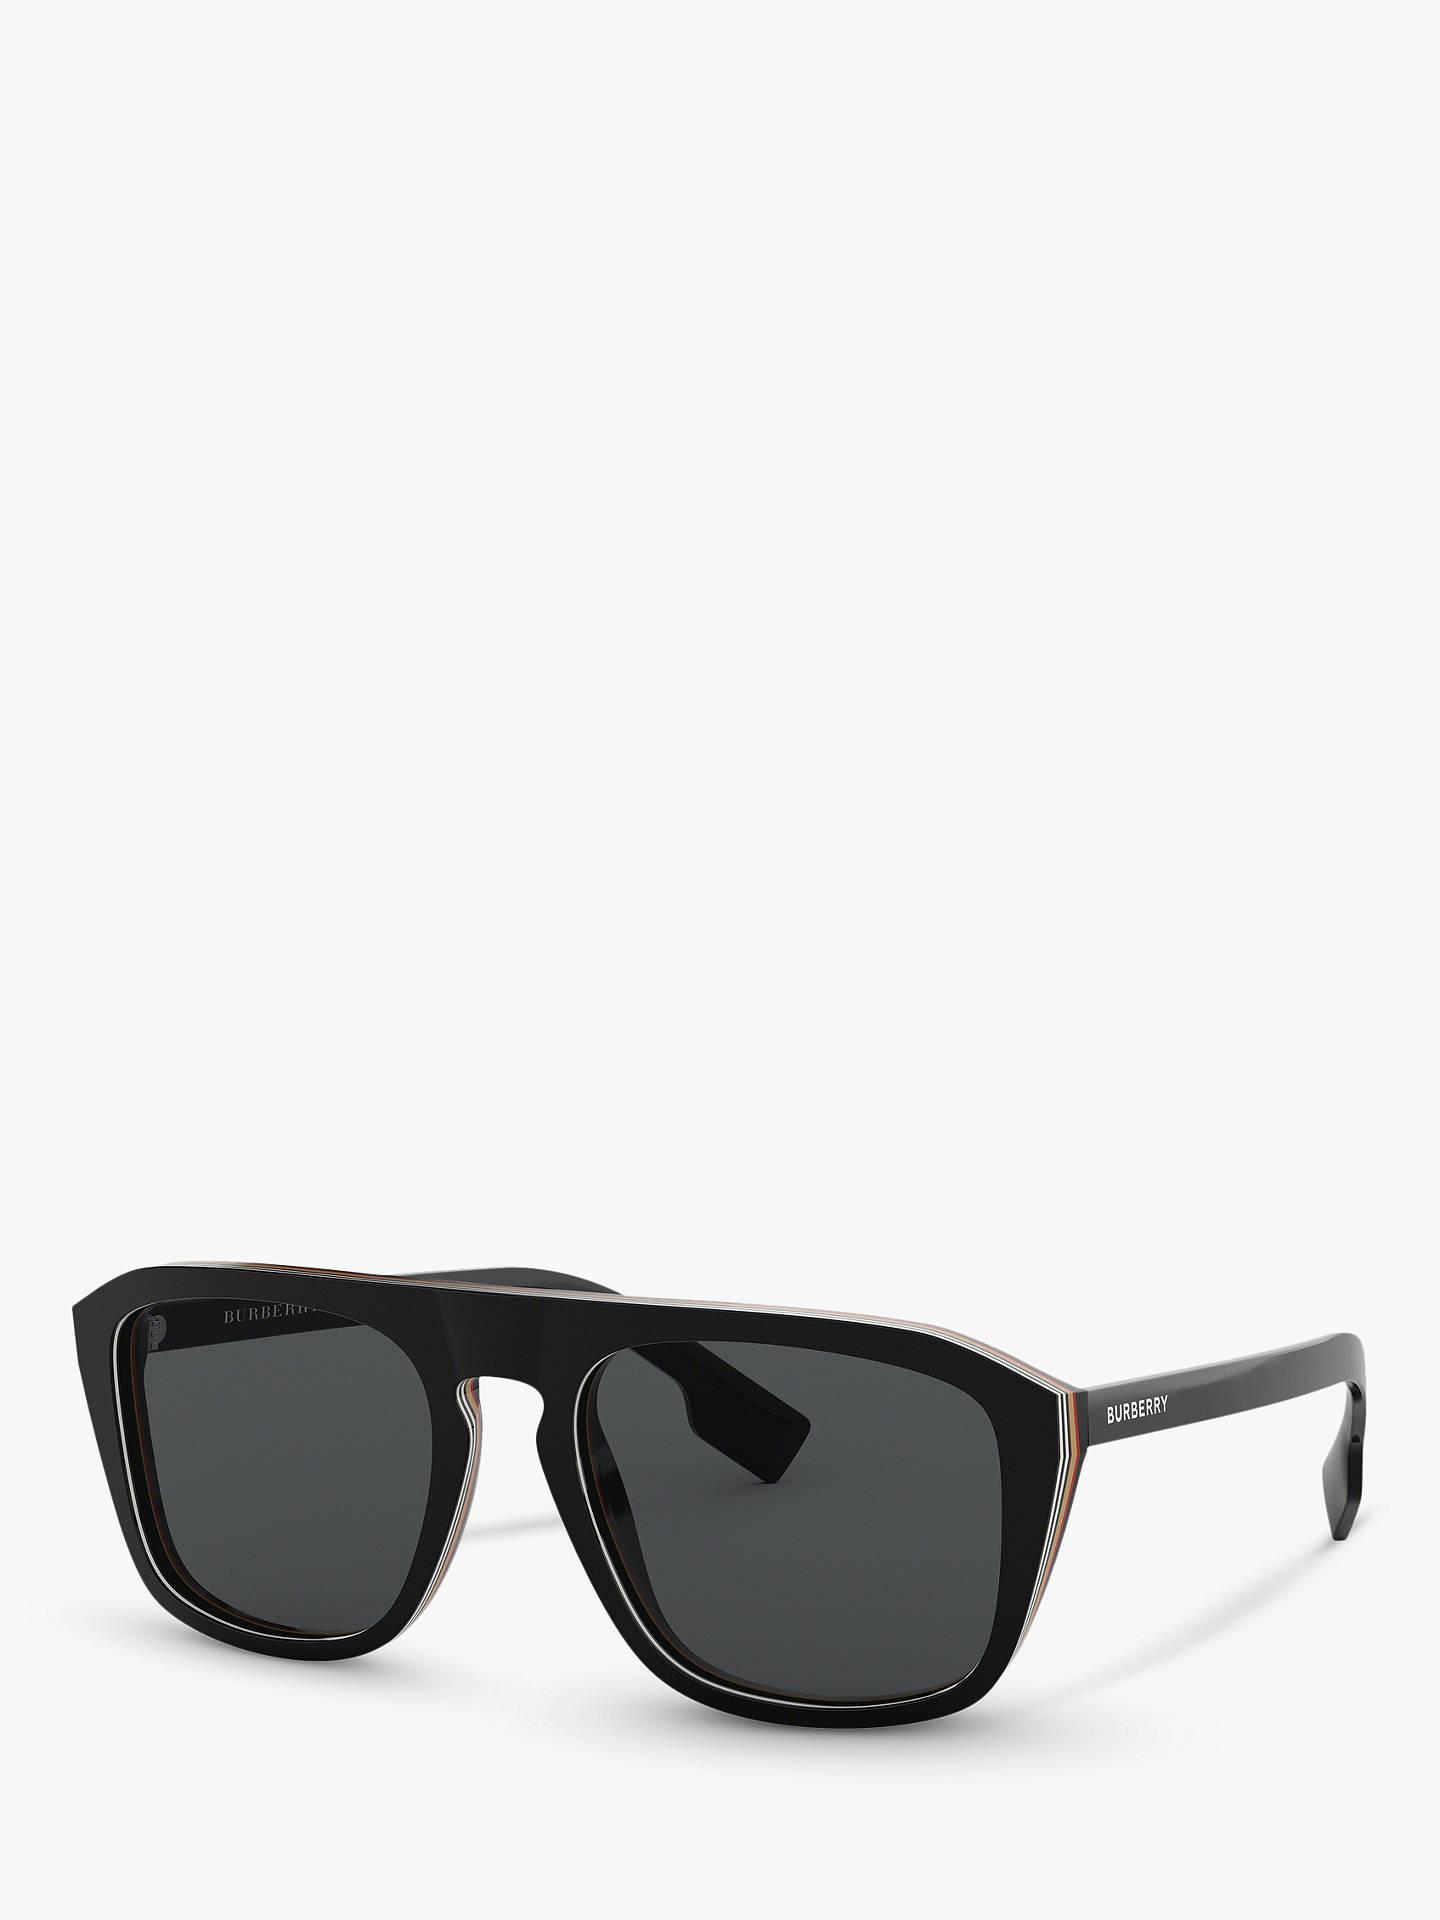 98ea0824822ef Burberry BE4286 Men s Polarised Square Sunglasses